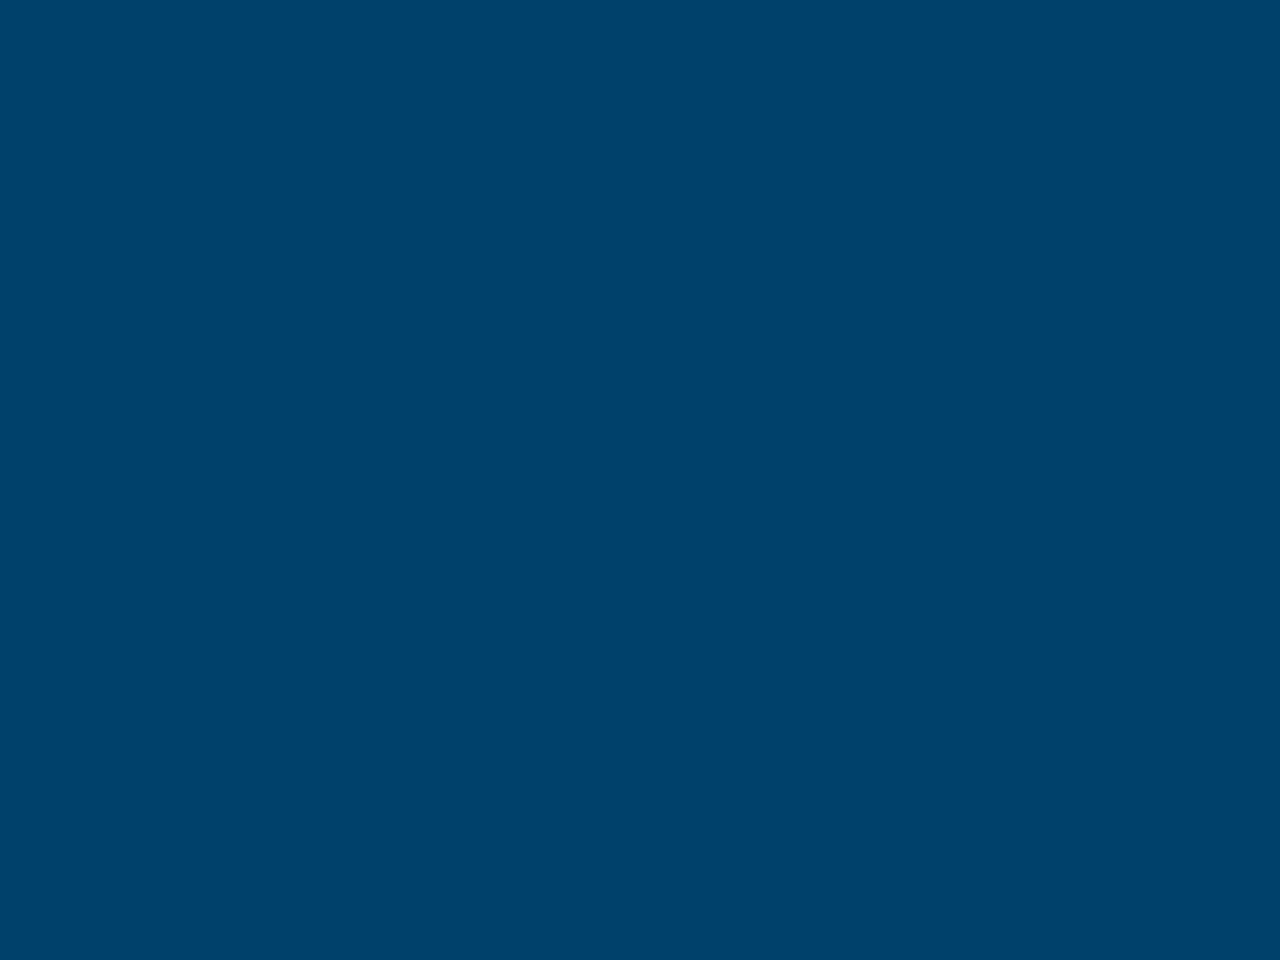 1280x960 Indigo Dye Solid Color Background